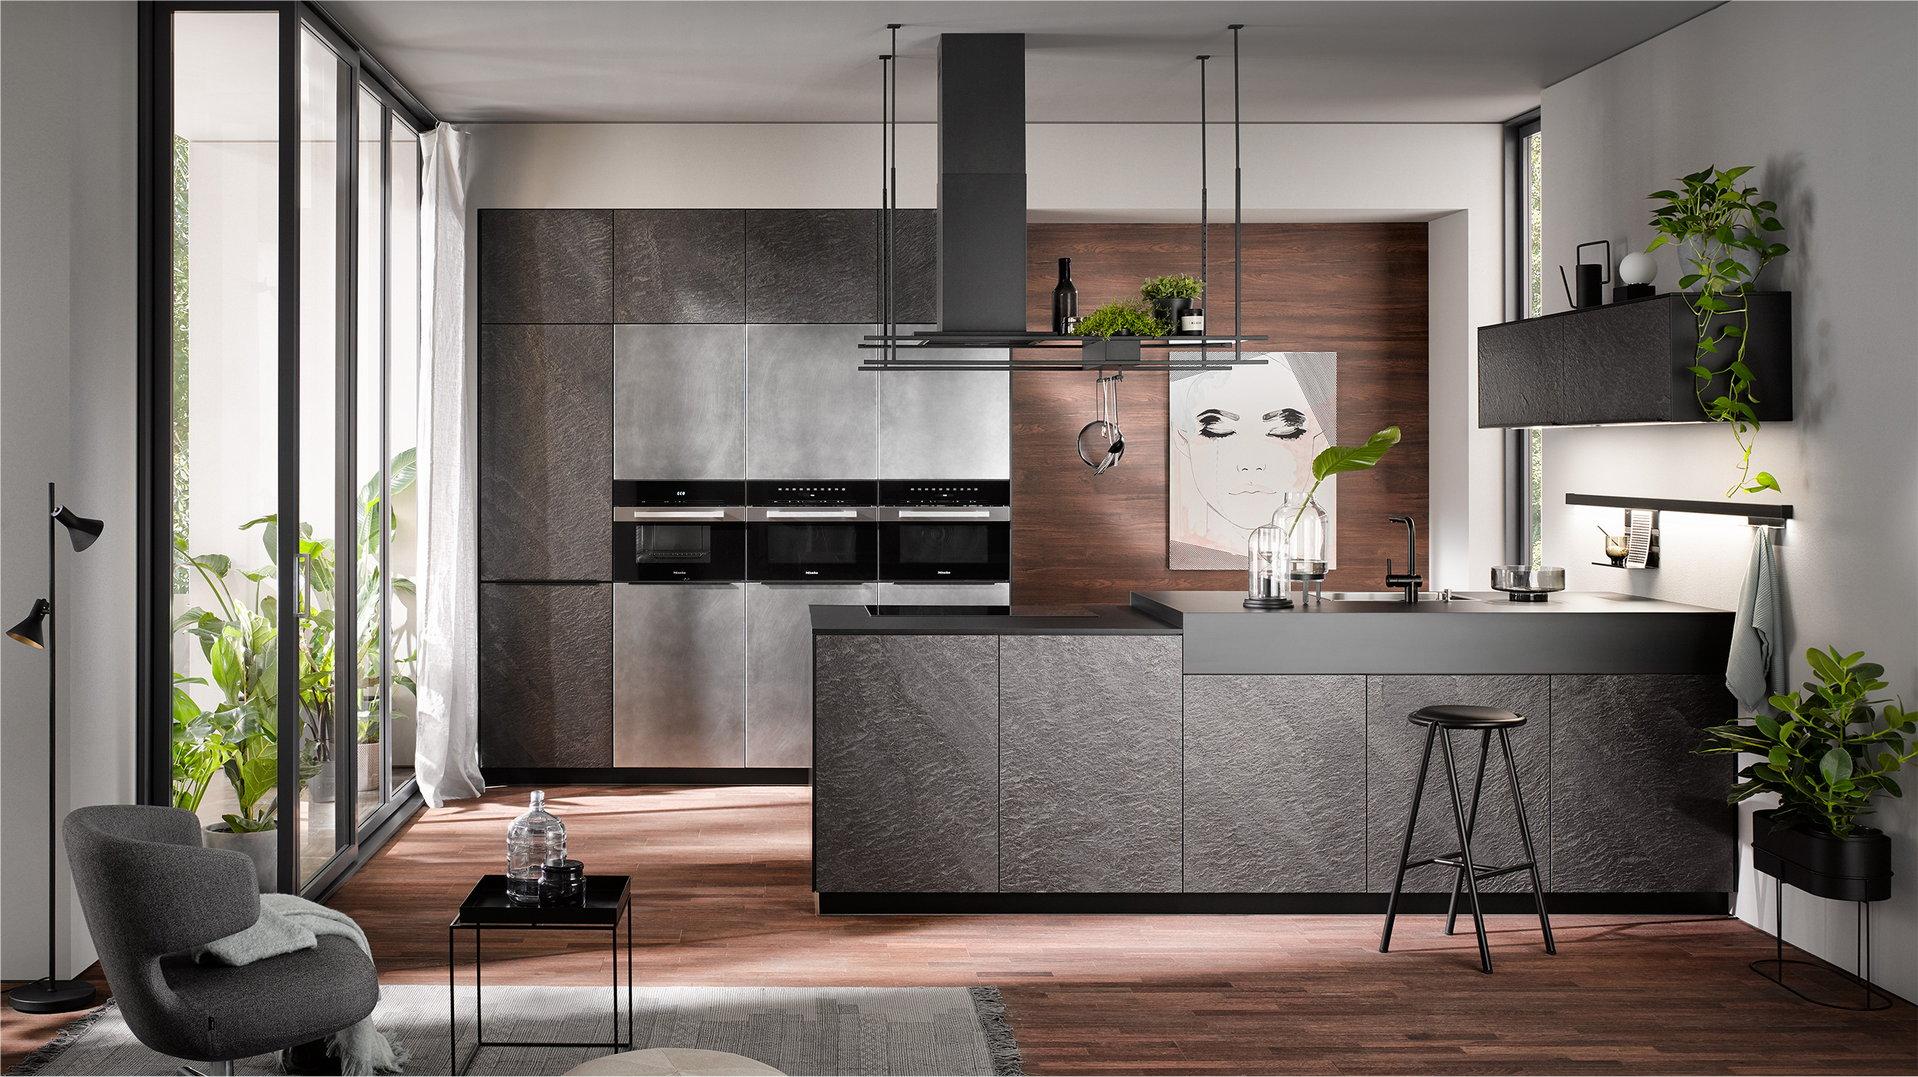 Moderne industriële keuken hout frontjes + zwarte keuken handgrepen, Häcker keuken AV 7030 Black Star, AV 7070 industrial steel